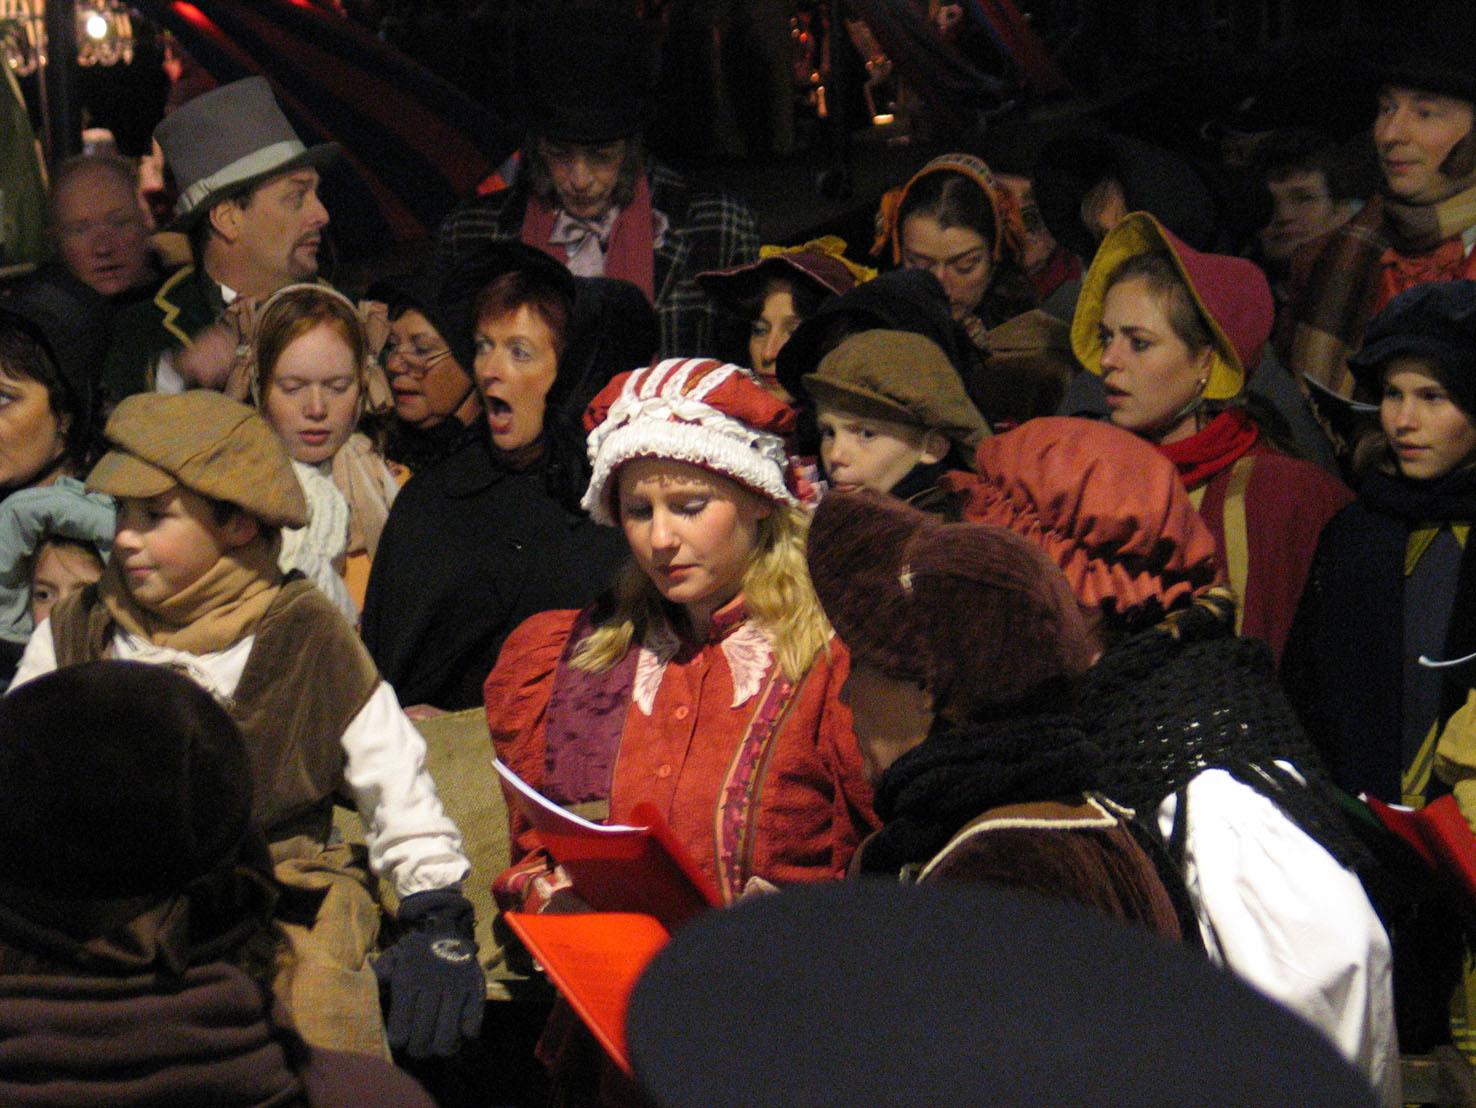 066 - Kerstmarkt Helmond 2003.jpg